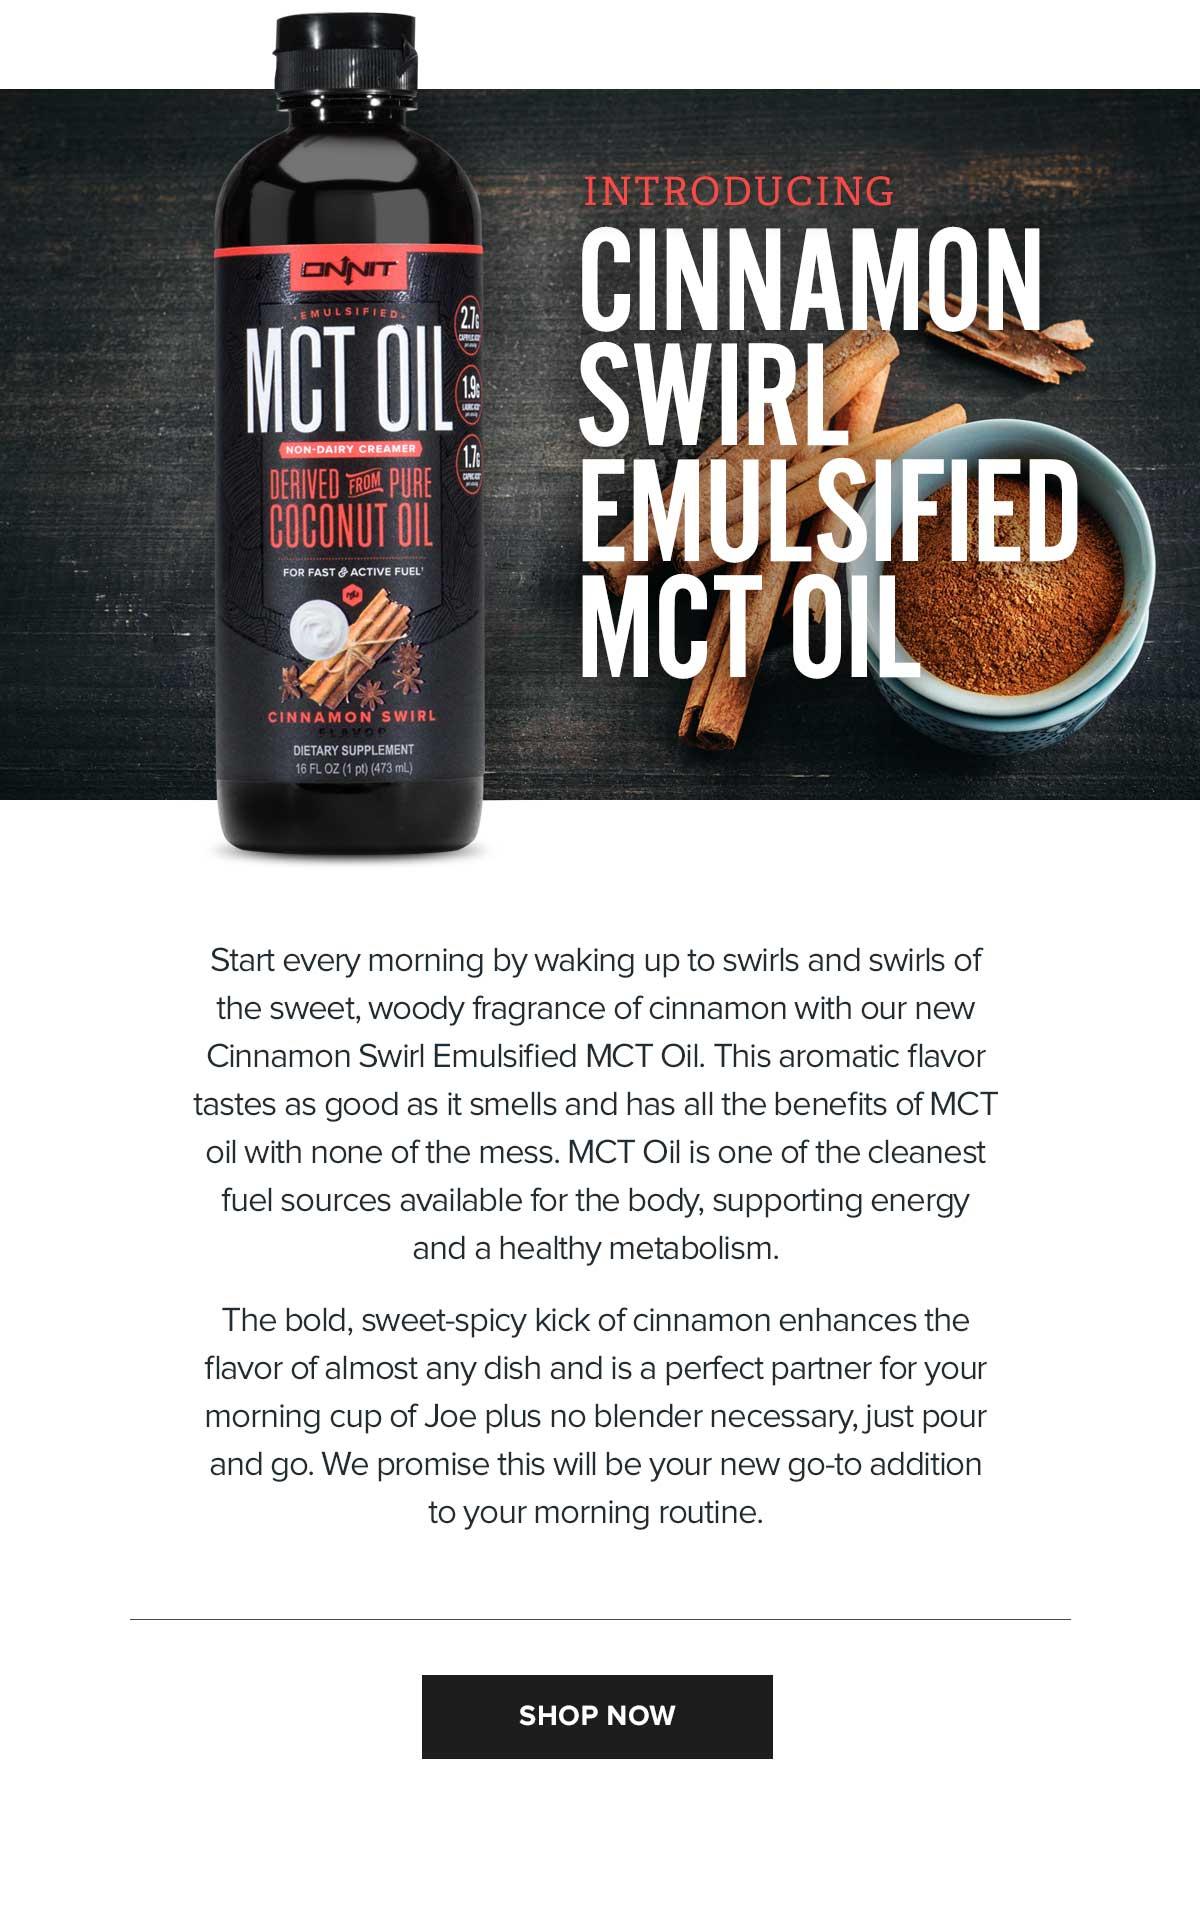 Introducing Cinnamon Swirl Emulsified MCT OIL Recipes